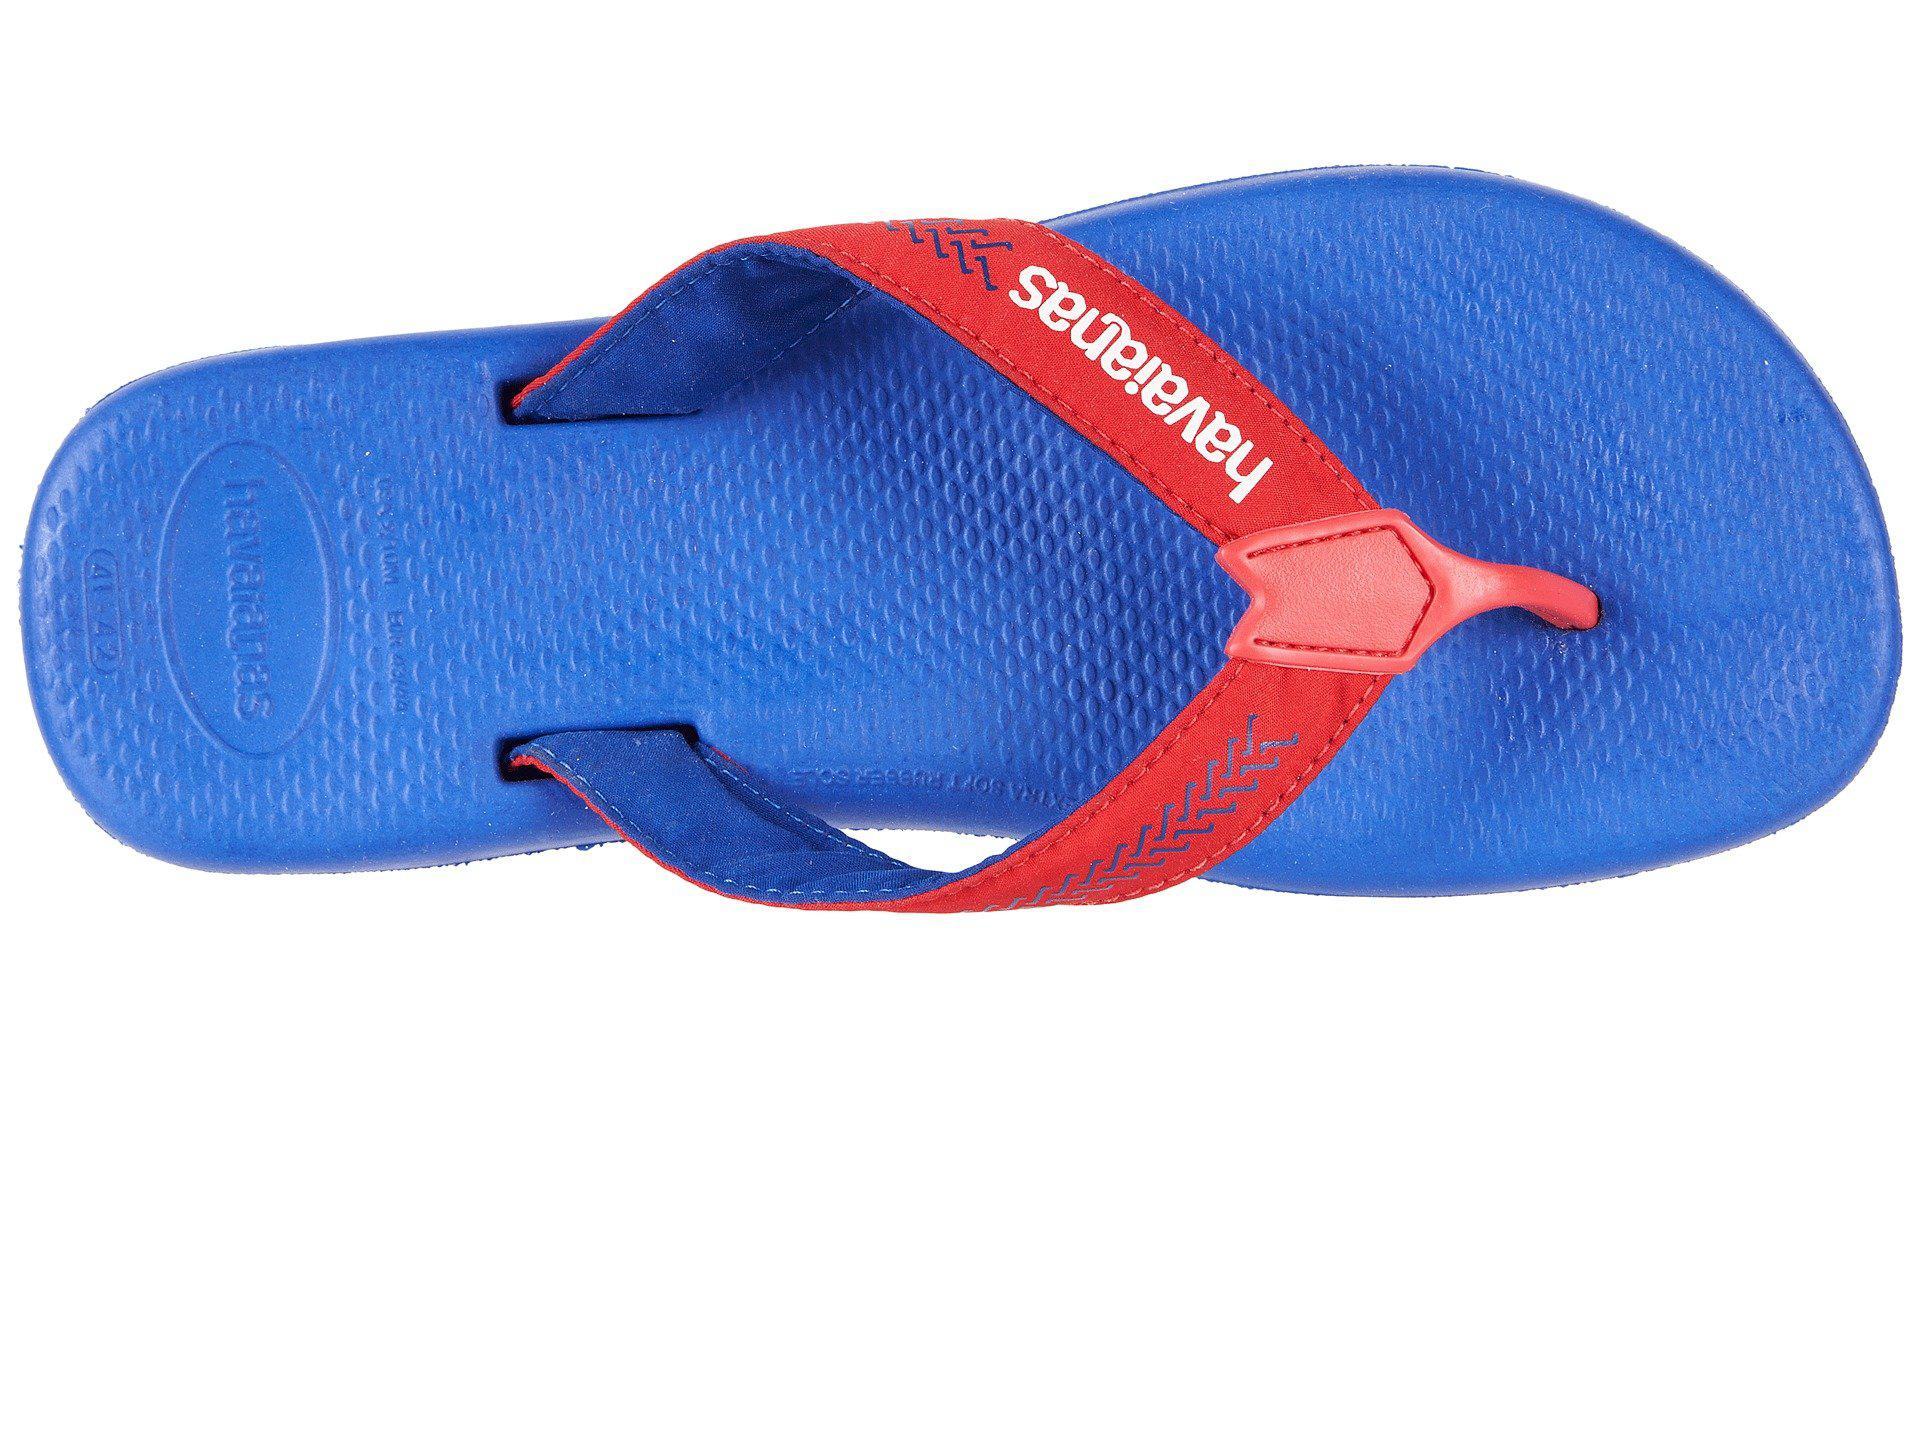 8ab6a4d01613f0 Lyst - Havaianas Surf Pro Flip Flops (steel Grey grey) Men s Sandals ...